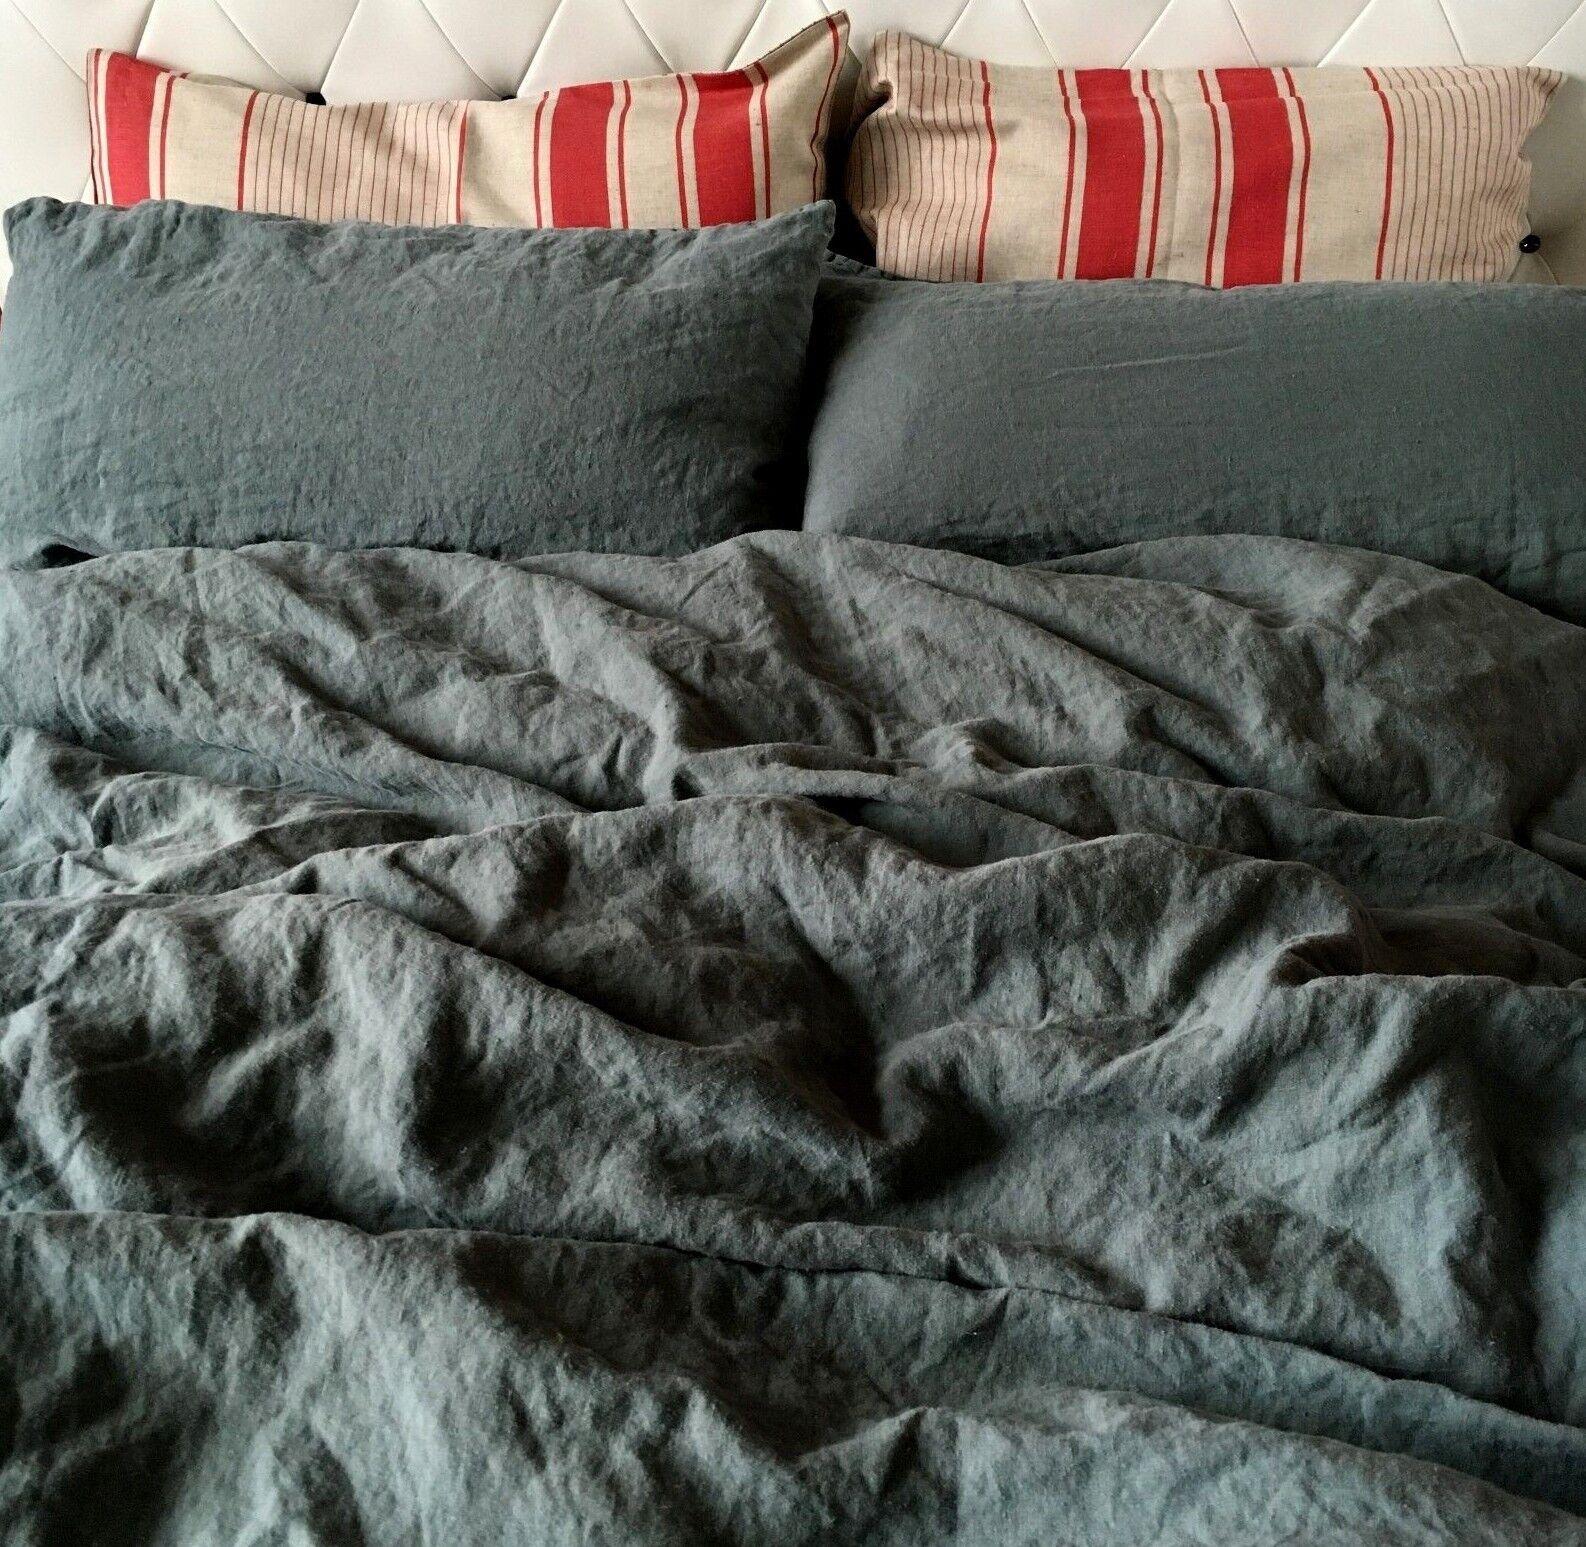 LINO biancheria da letto-Set 100% Lino  Stonewashed  (200x200, 2 St. 50x70 cm) petrolio